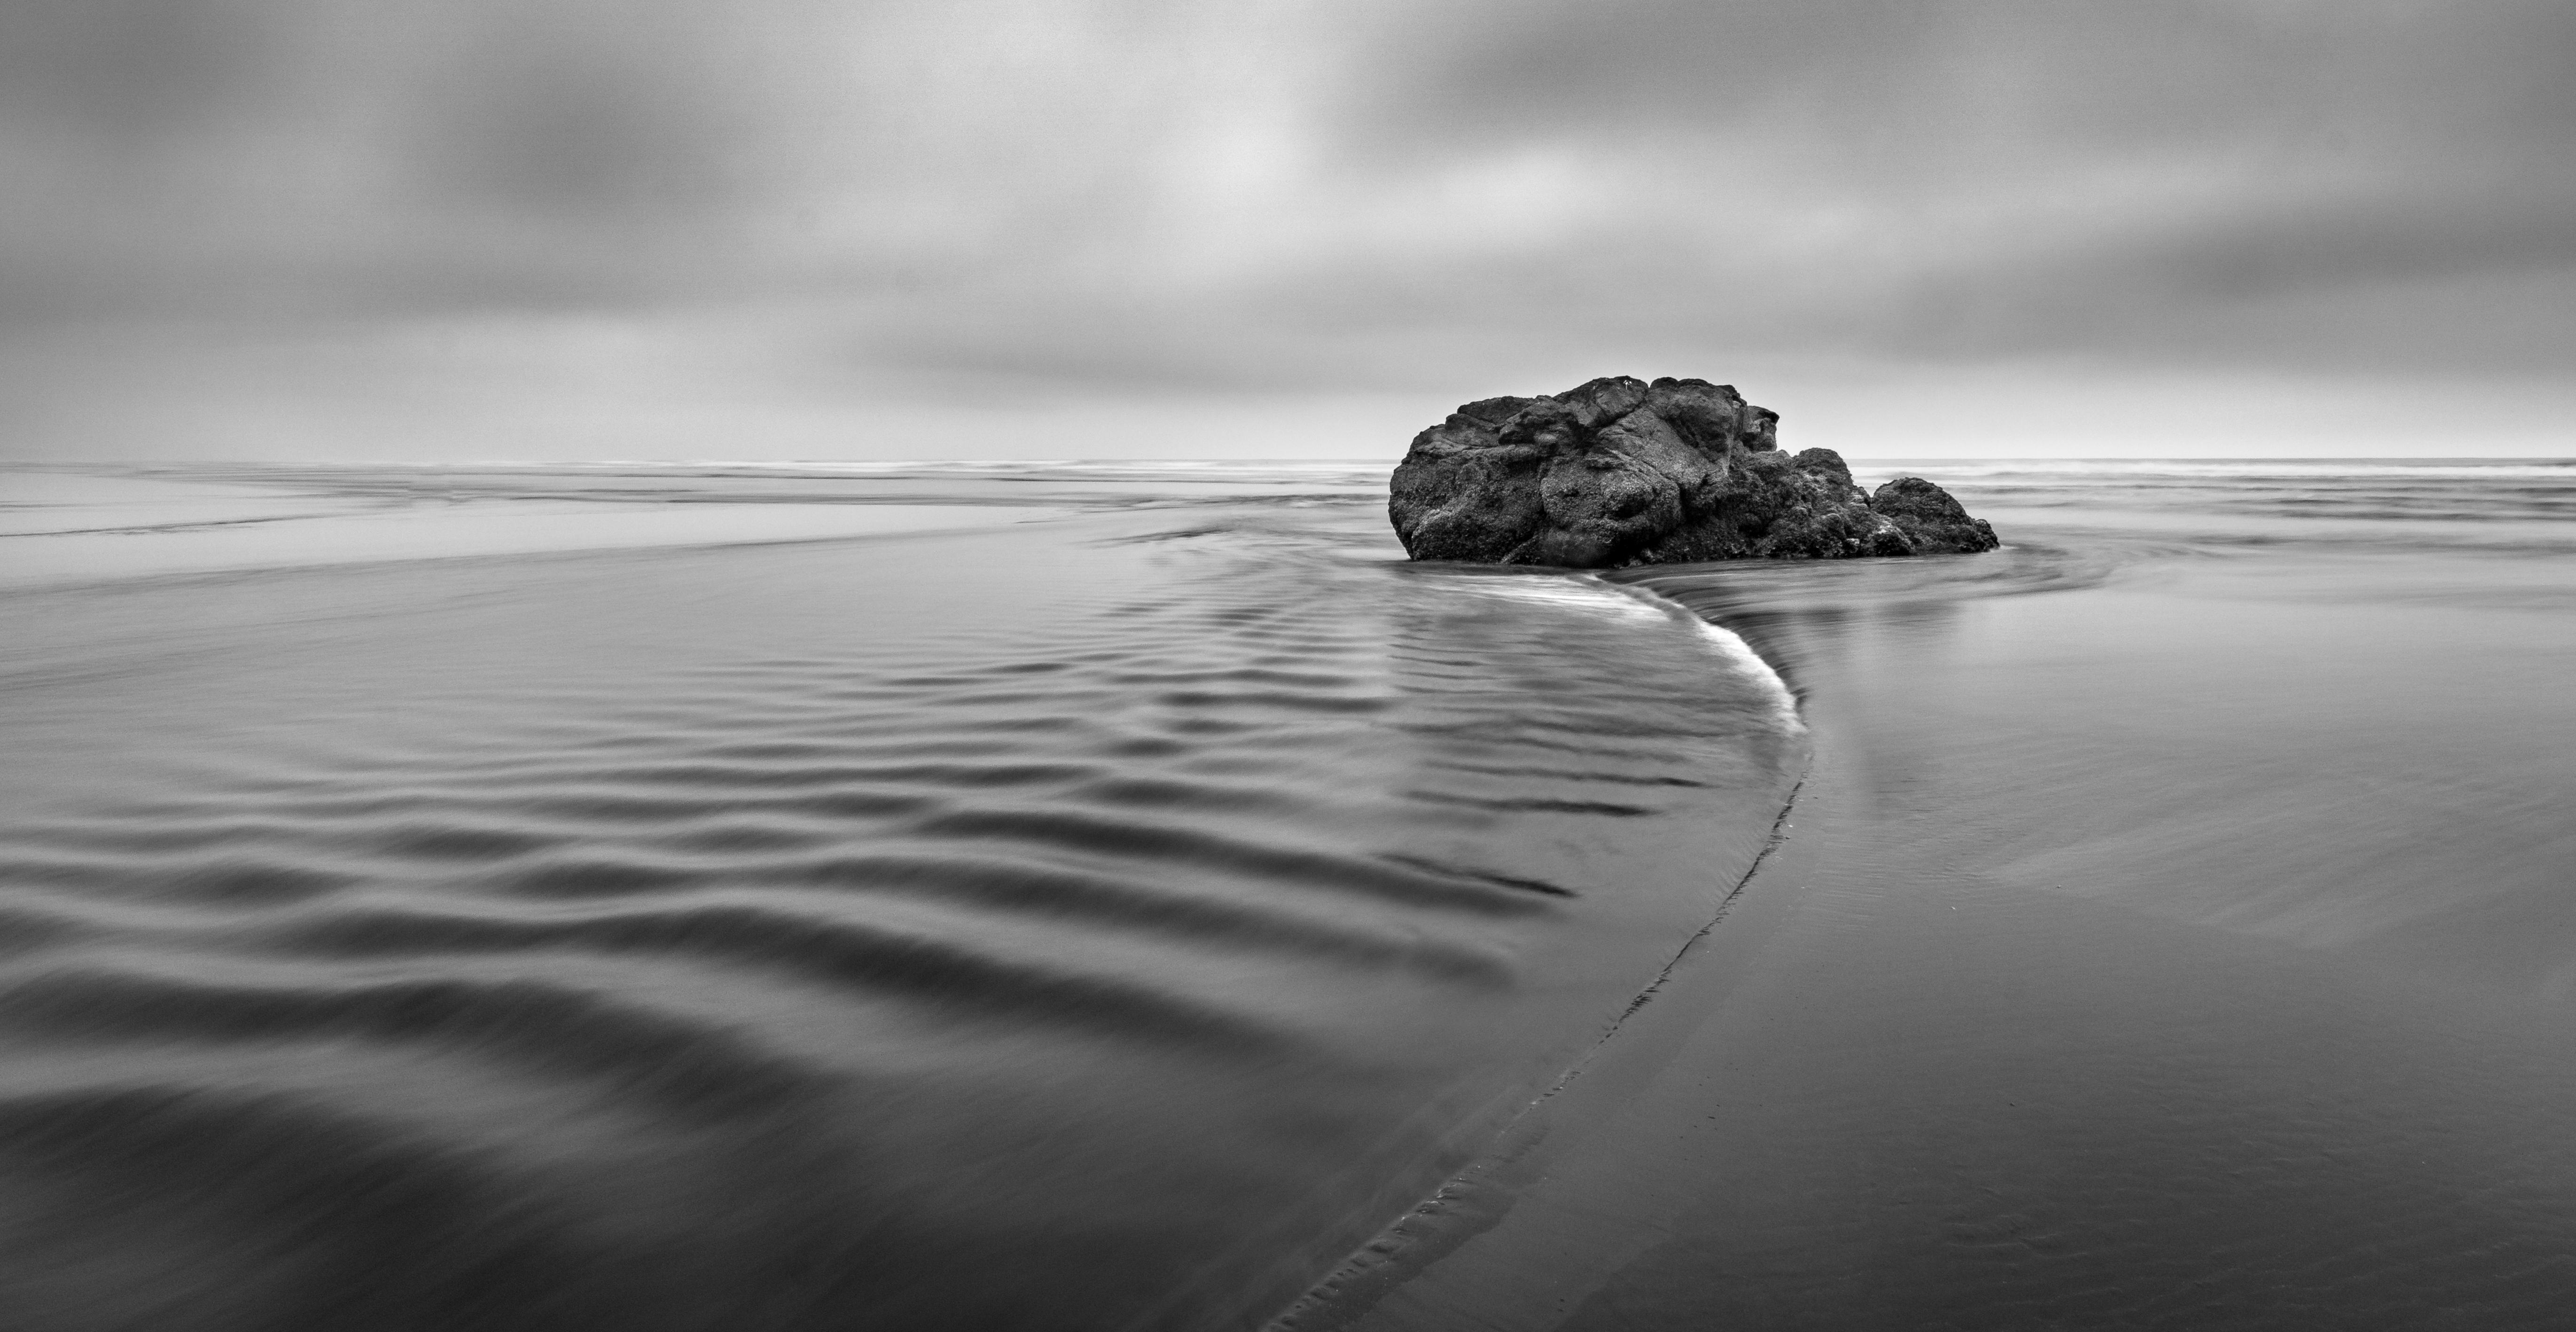 Free images beach sea coast nature sand rock ocean horizon